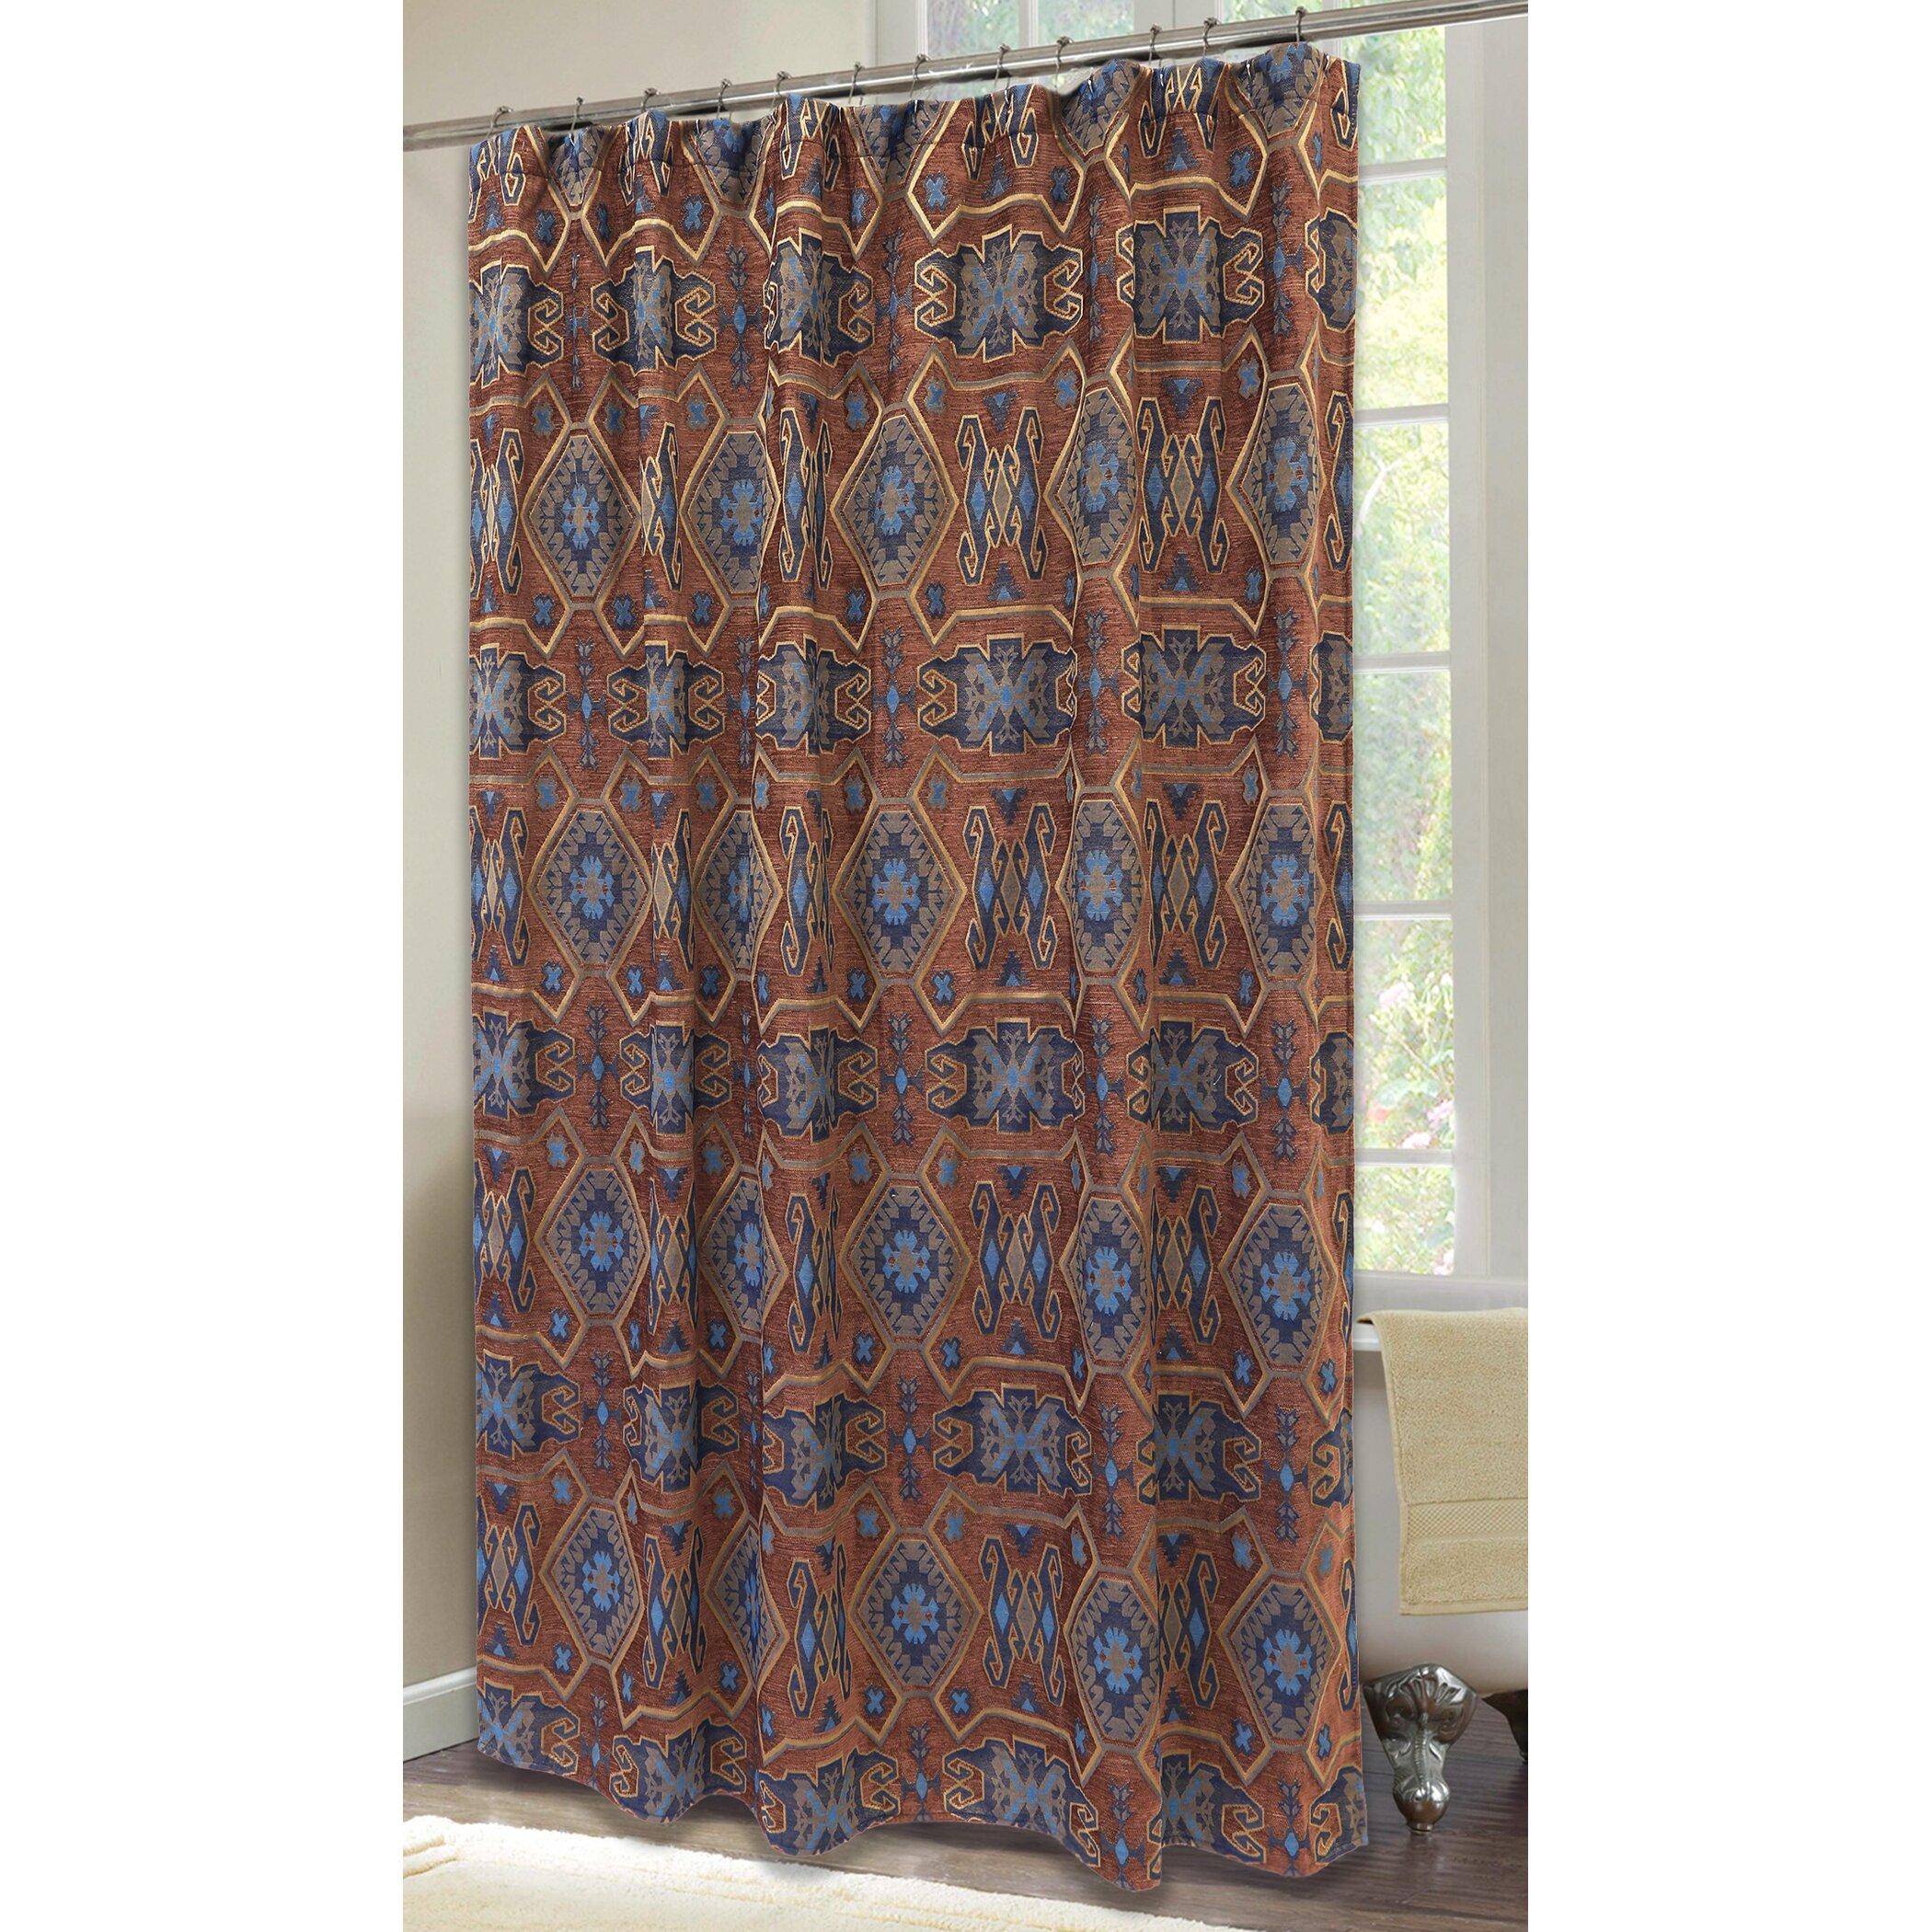 Saguaro Desert Southwestern Turquoise Shower Curtain Wayfair